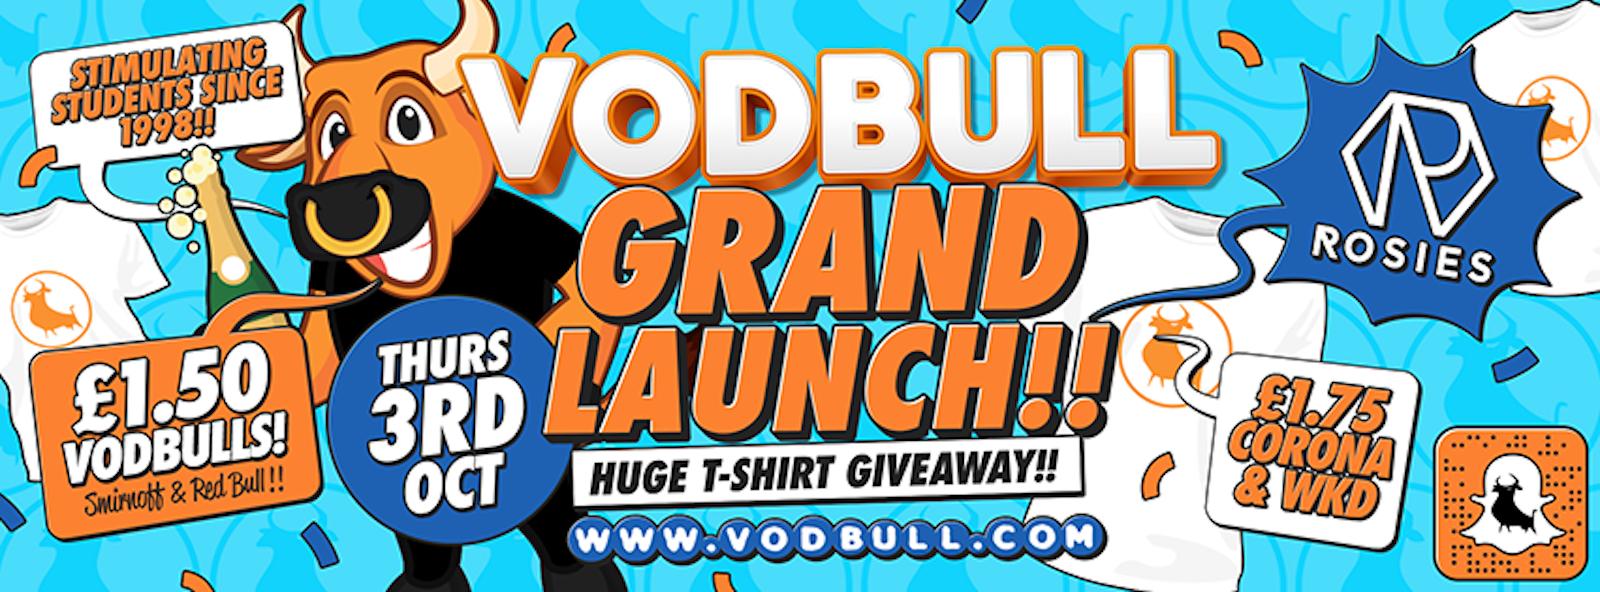 Vodbull GRAND LAUNCH!!